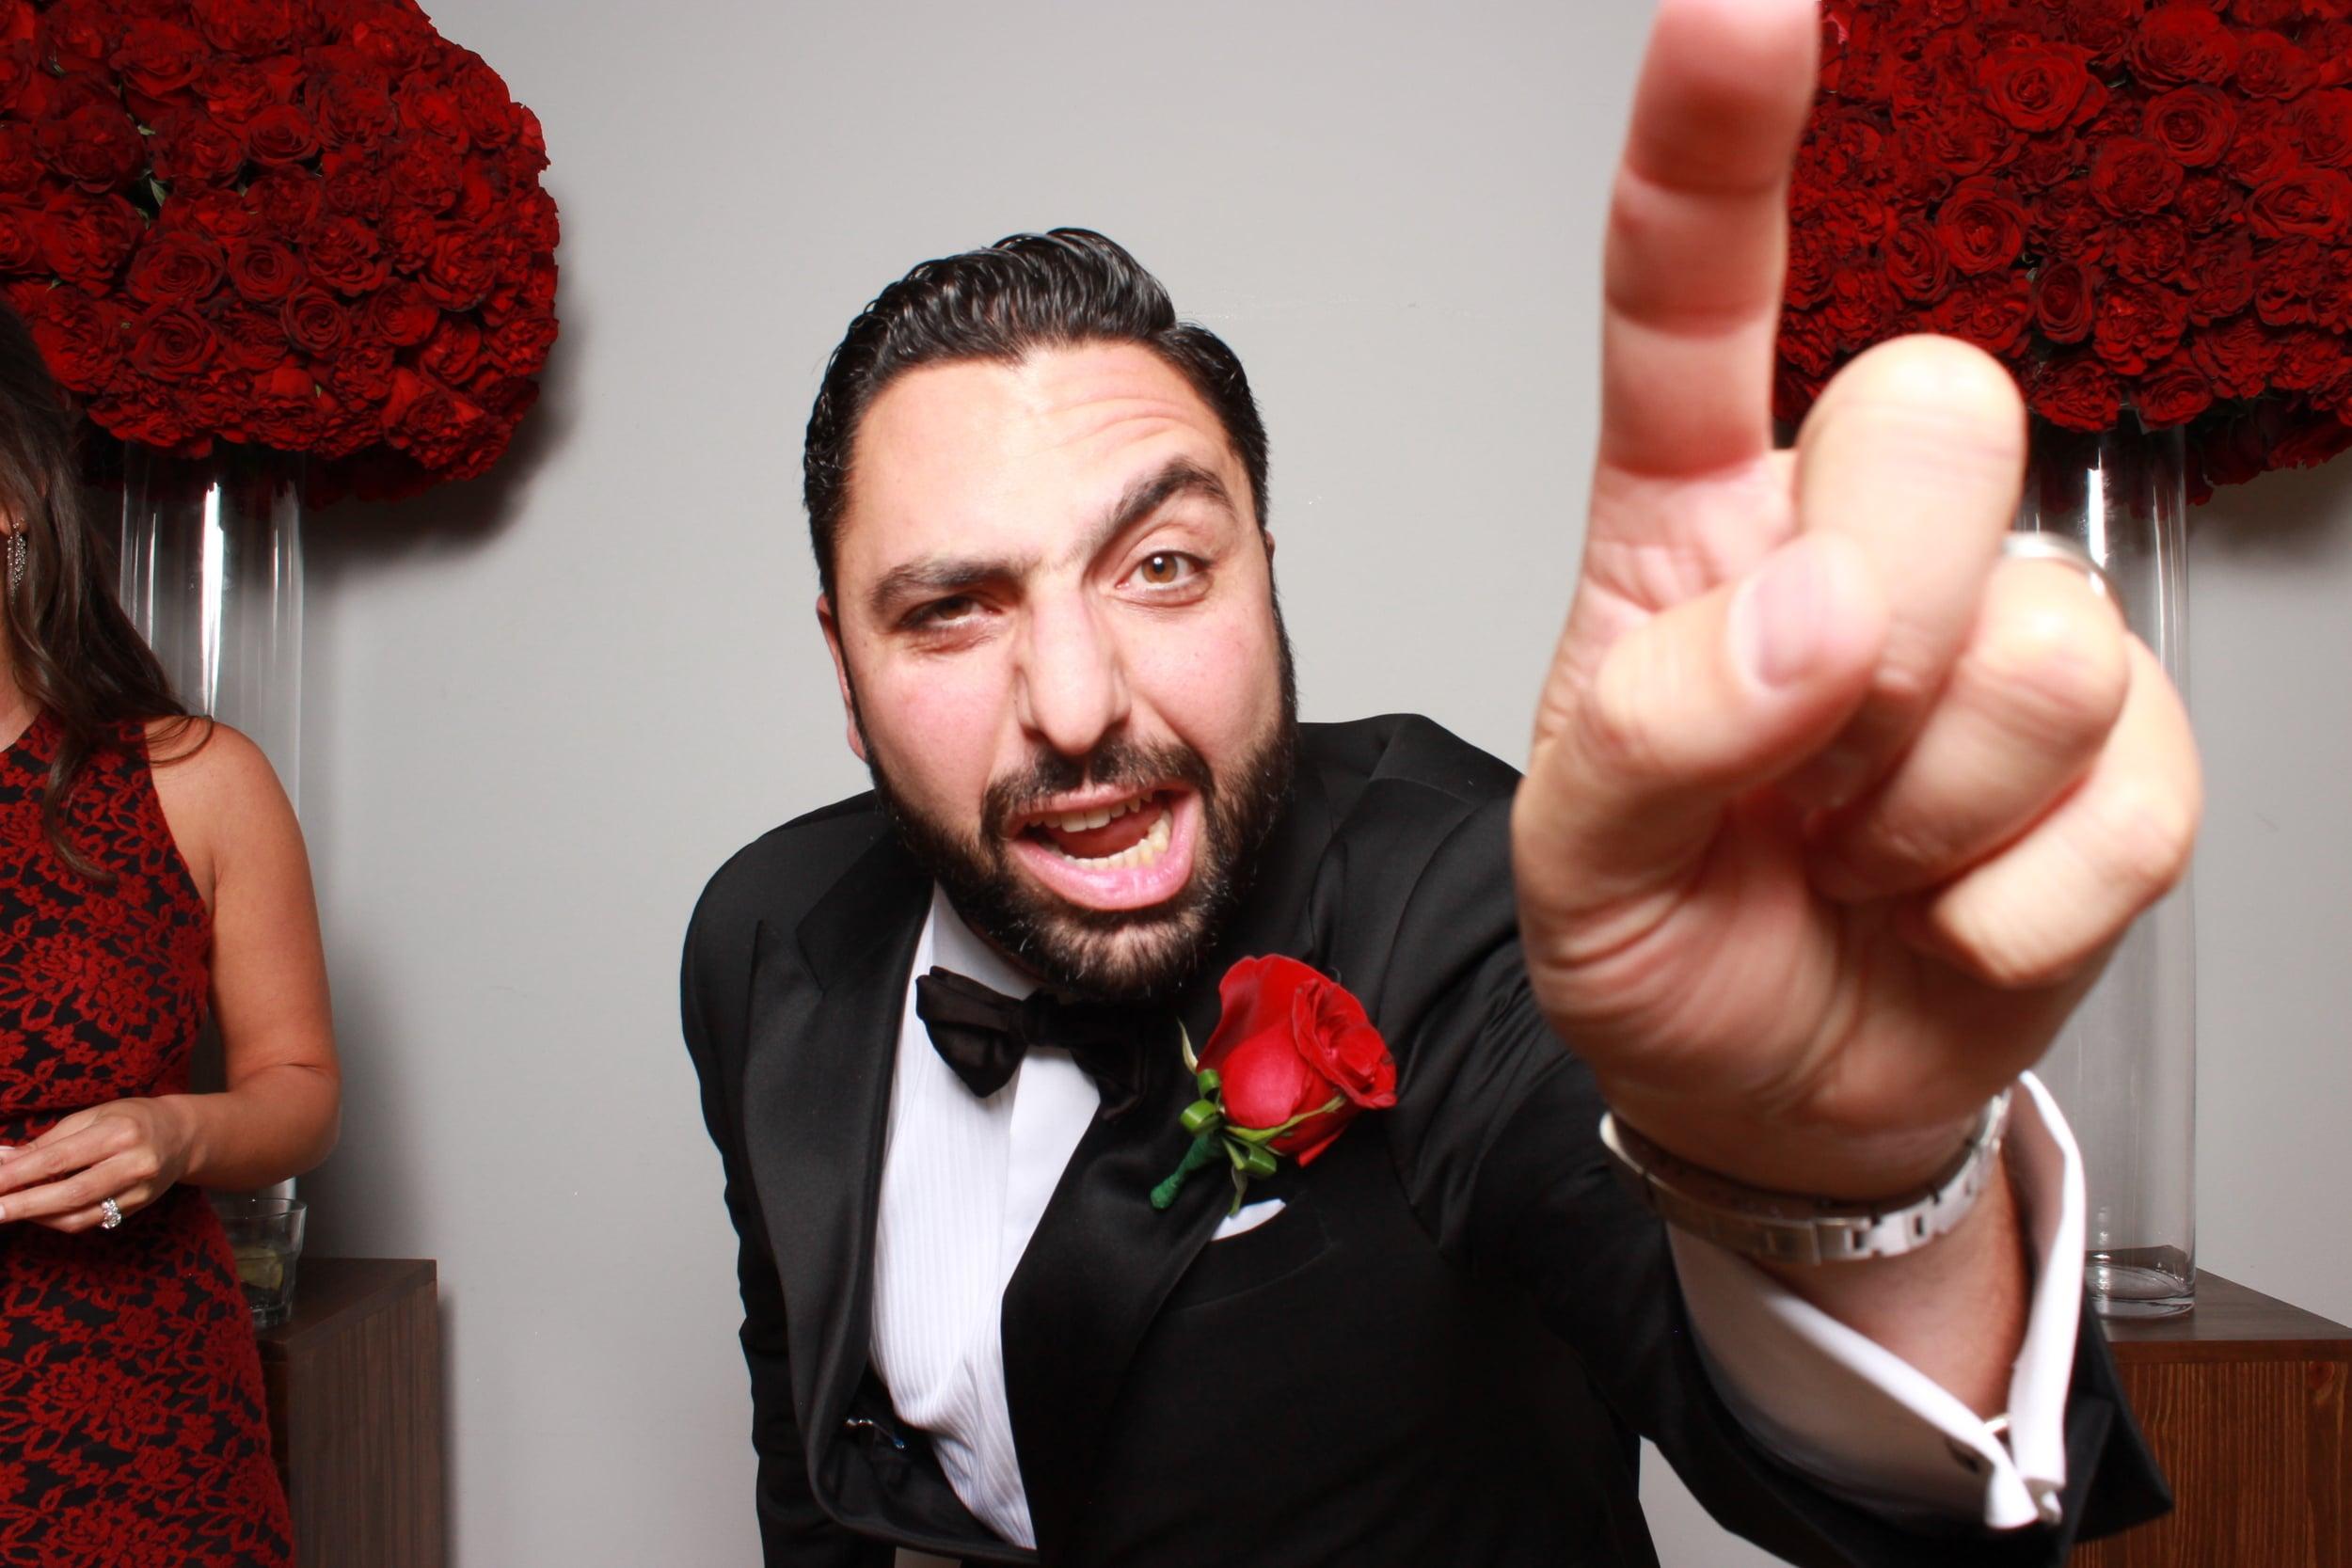 ottawa-wedding-photobooth-56.JPG